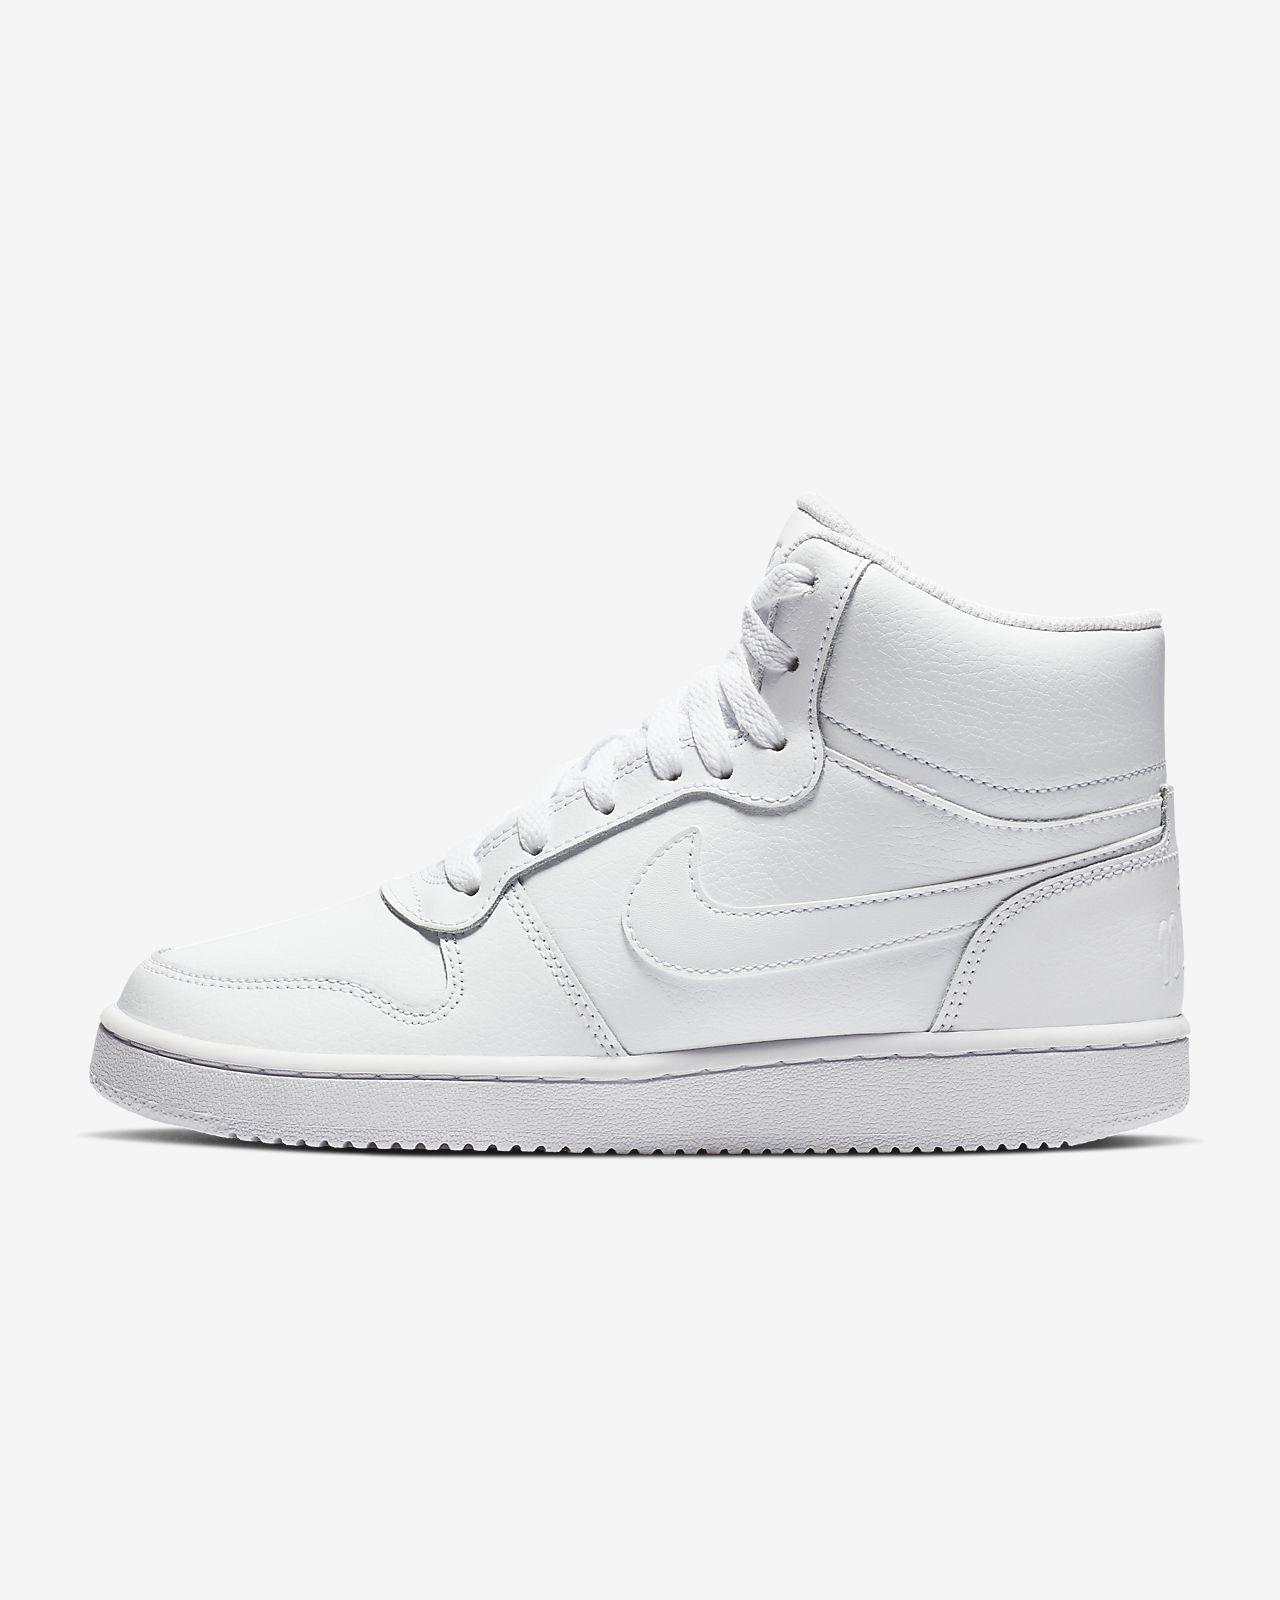 Nike chaussures de basketball wmns ebernon mi prem femmes